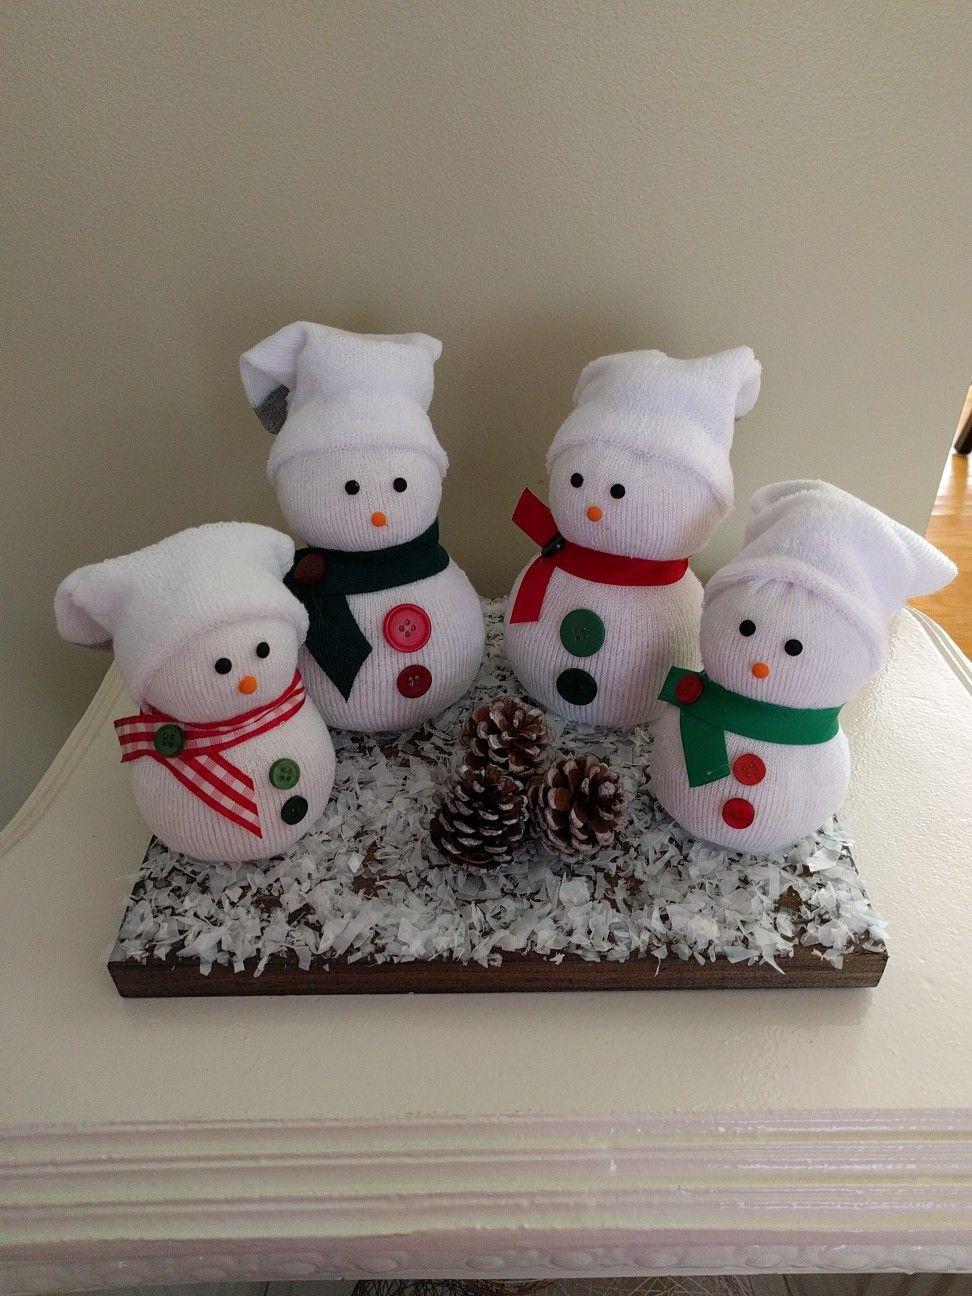 ($40) Snow Sockman Family! ☃️⛄️⛄️☃️ #NeateCrafts #DIY